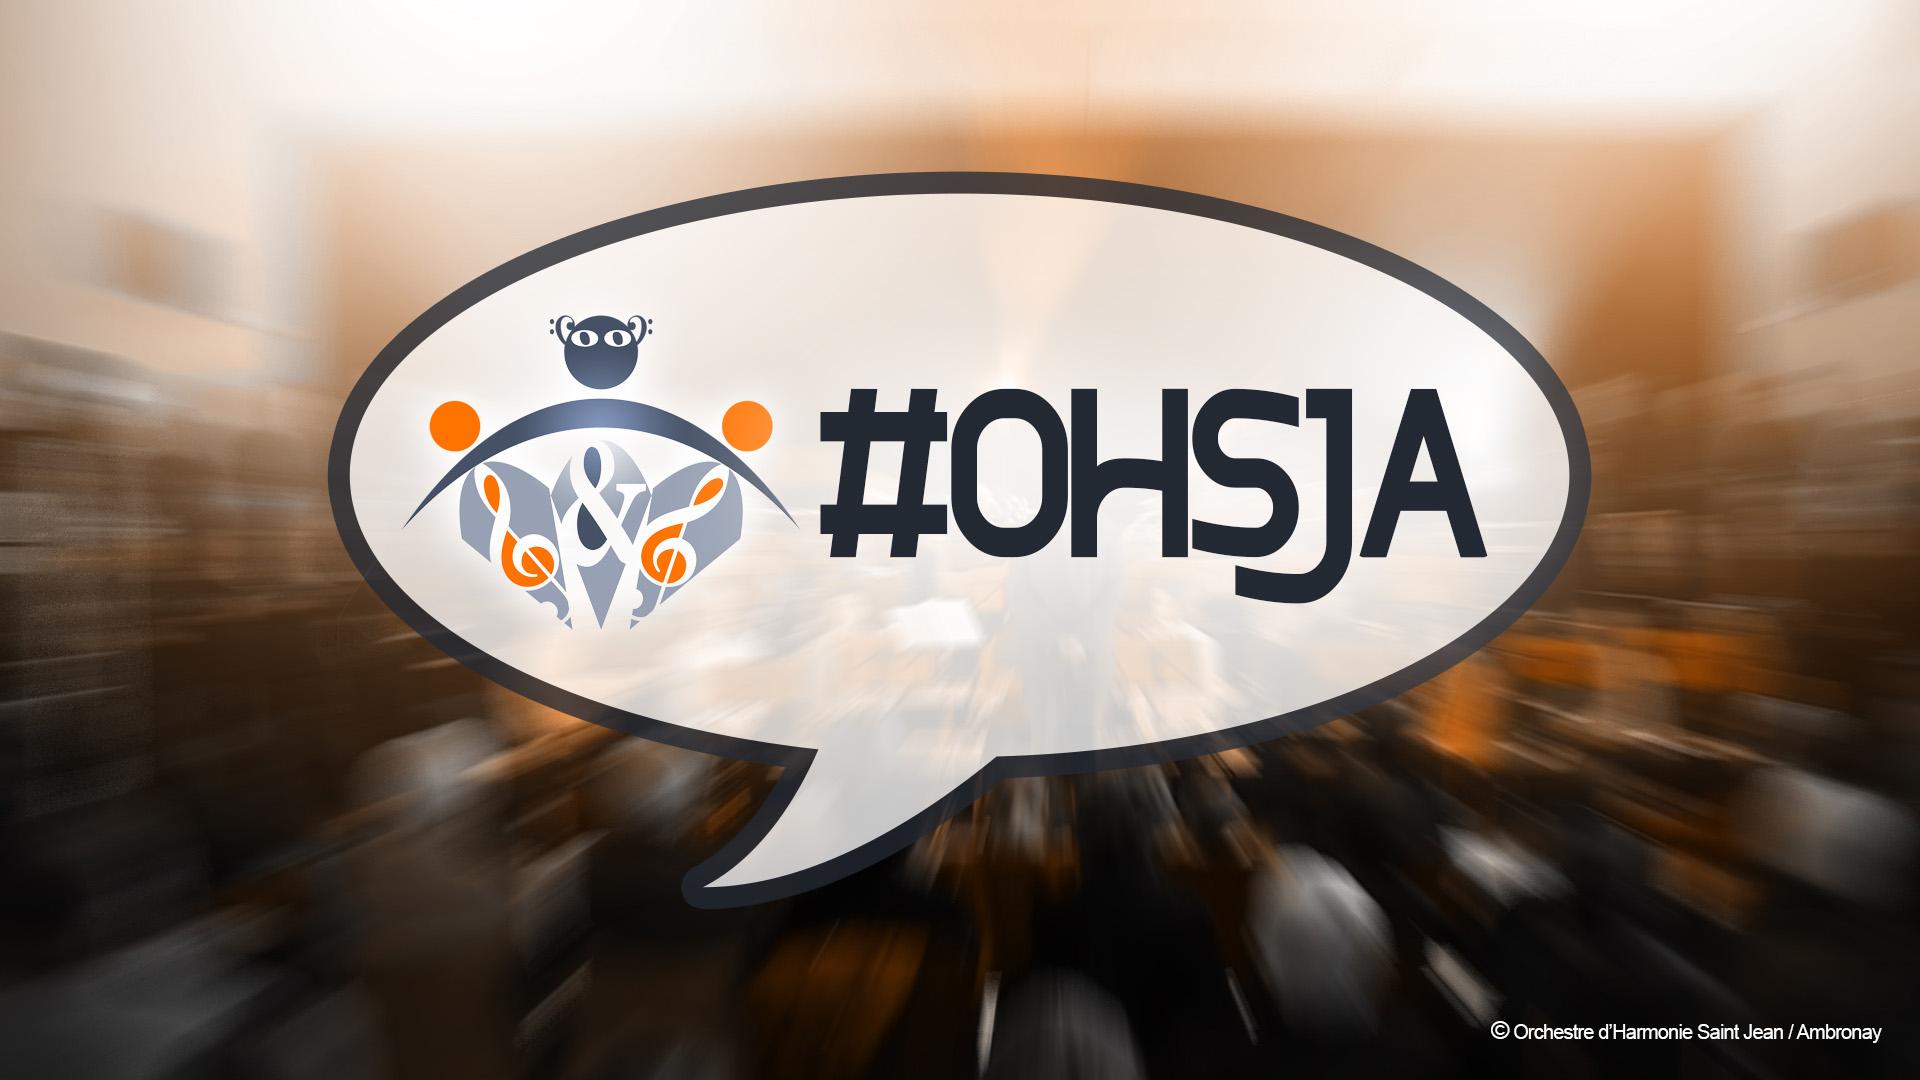 Hashtag ohsja